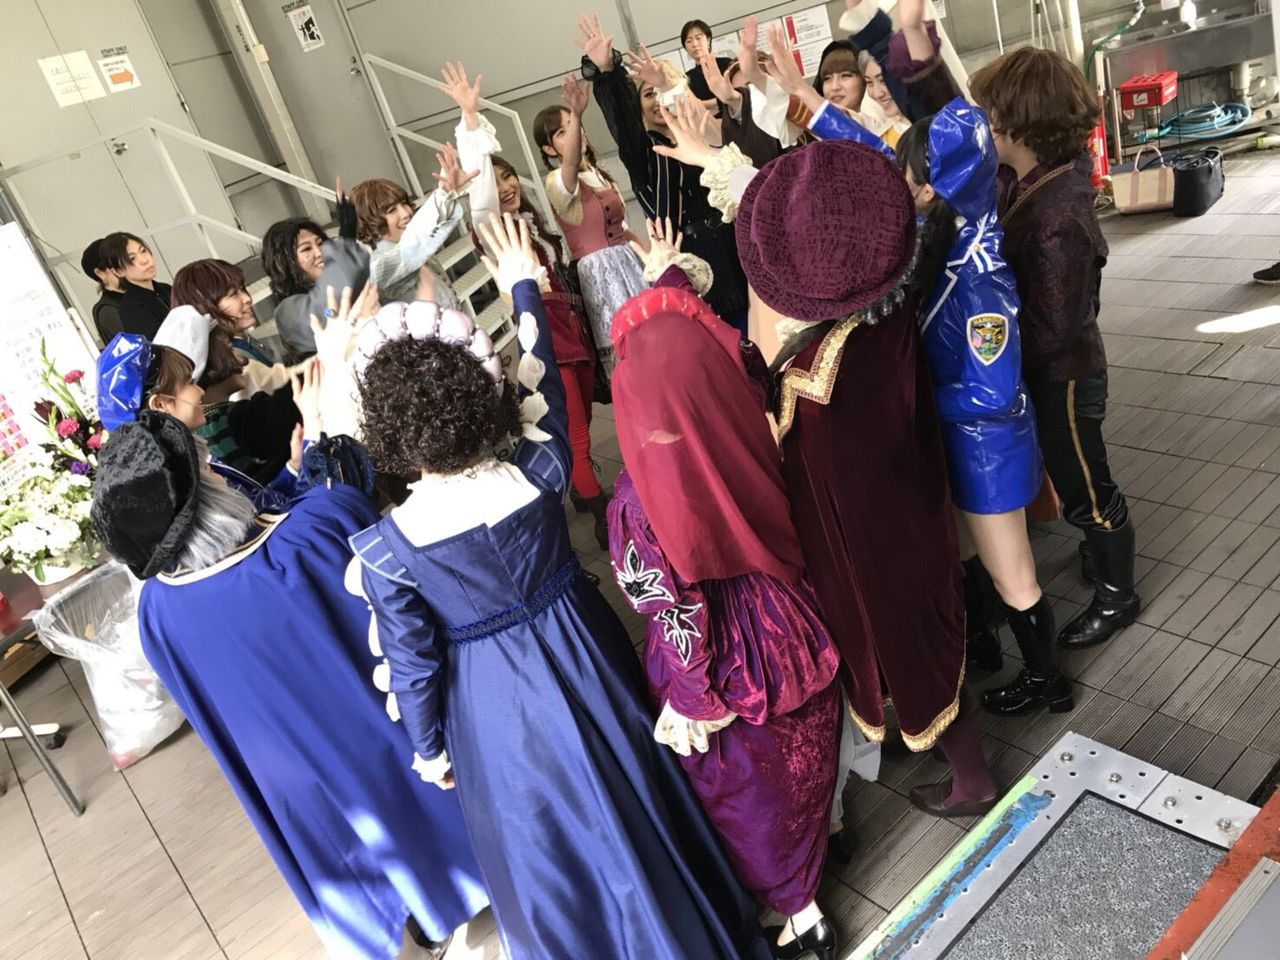 【AKB48】劇団れなっちを観に行くとトイレに行きたくなる謎